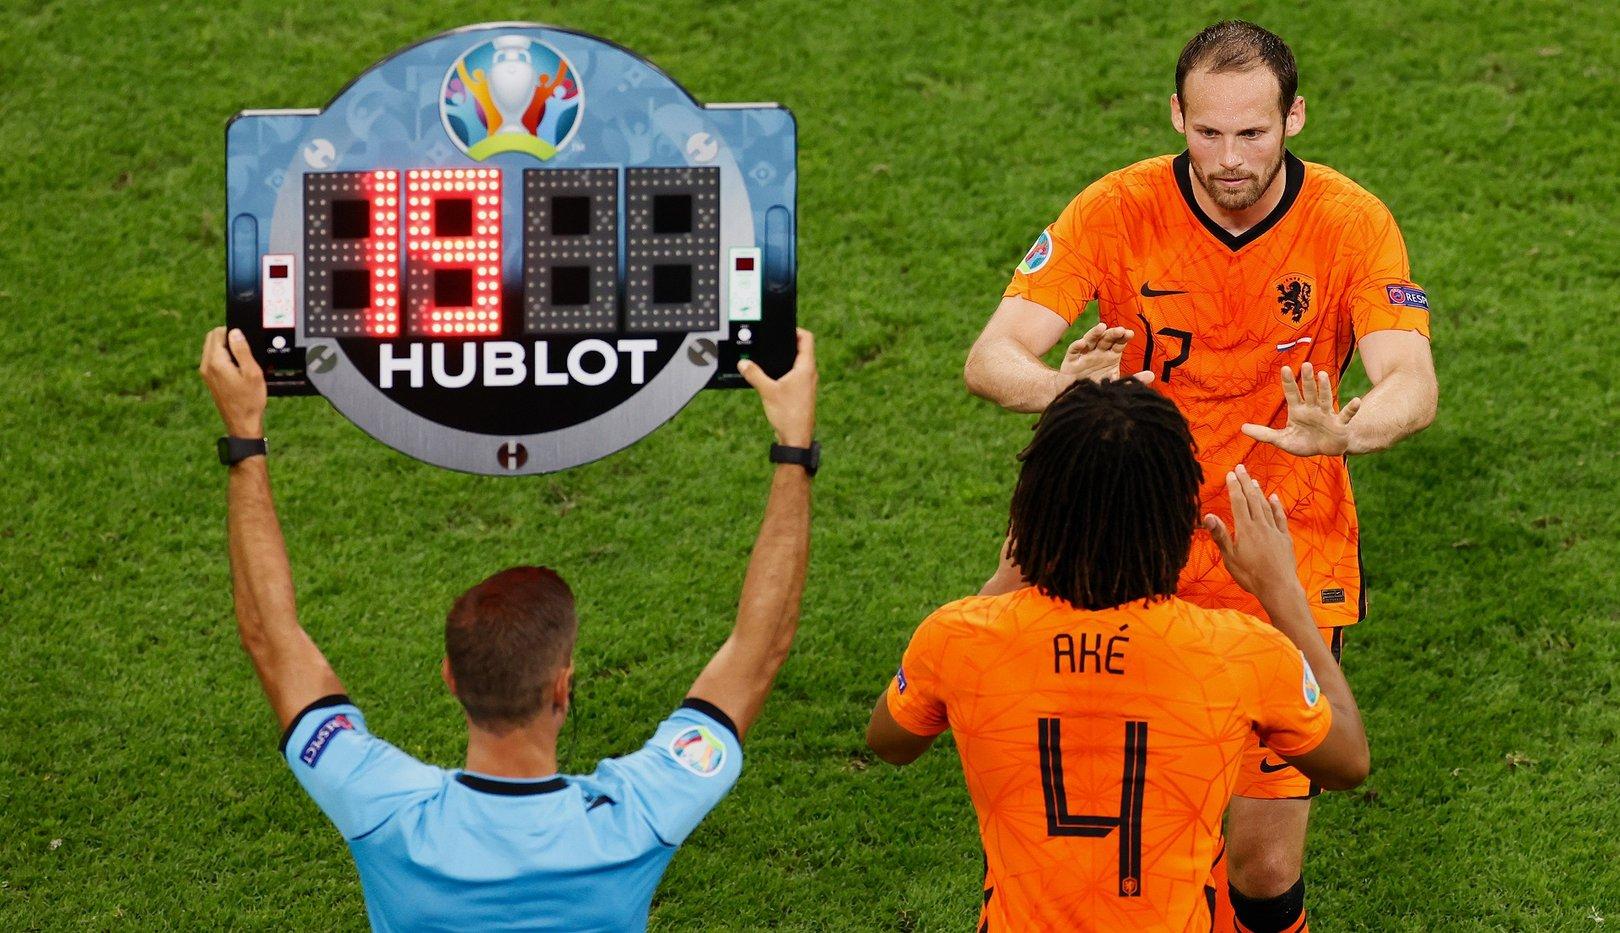 Ake plays final third as Dutch secure knockout berth